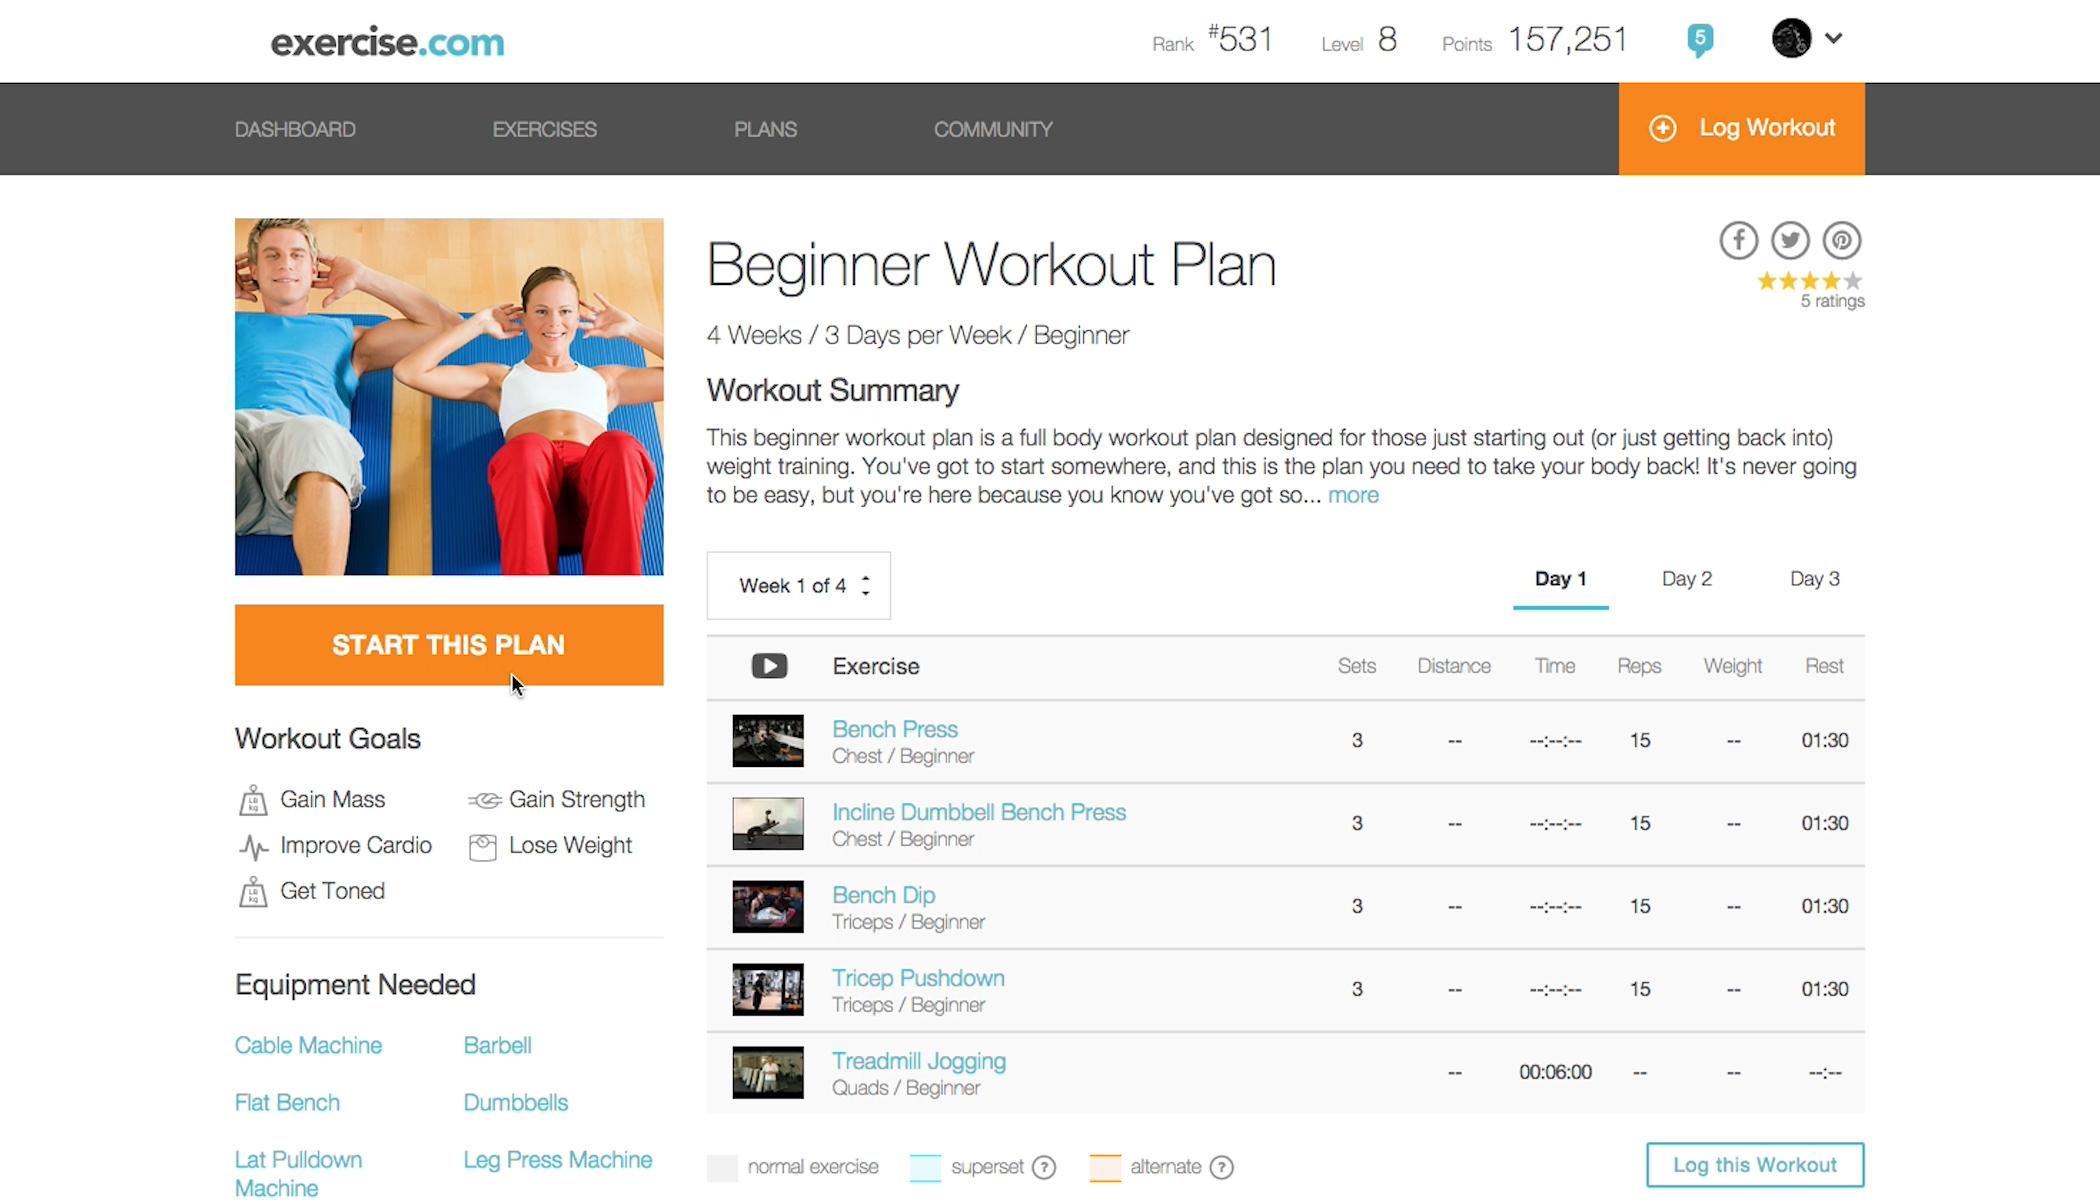 Upgrade To PRO Follow This Workout Plan